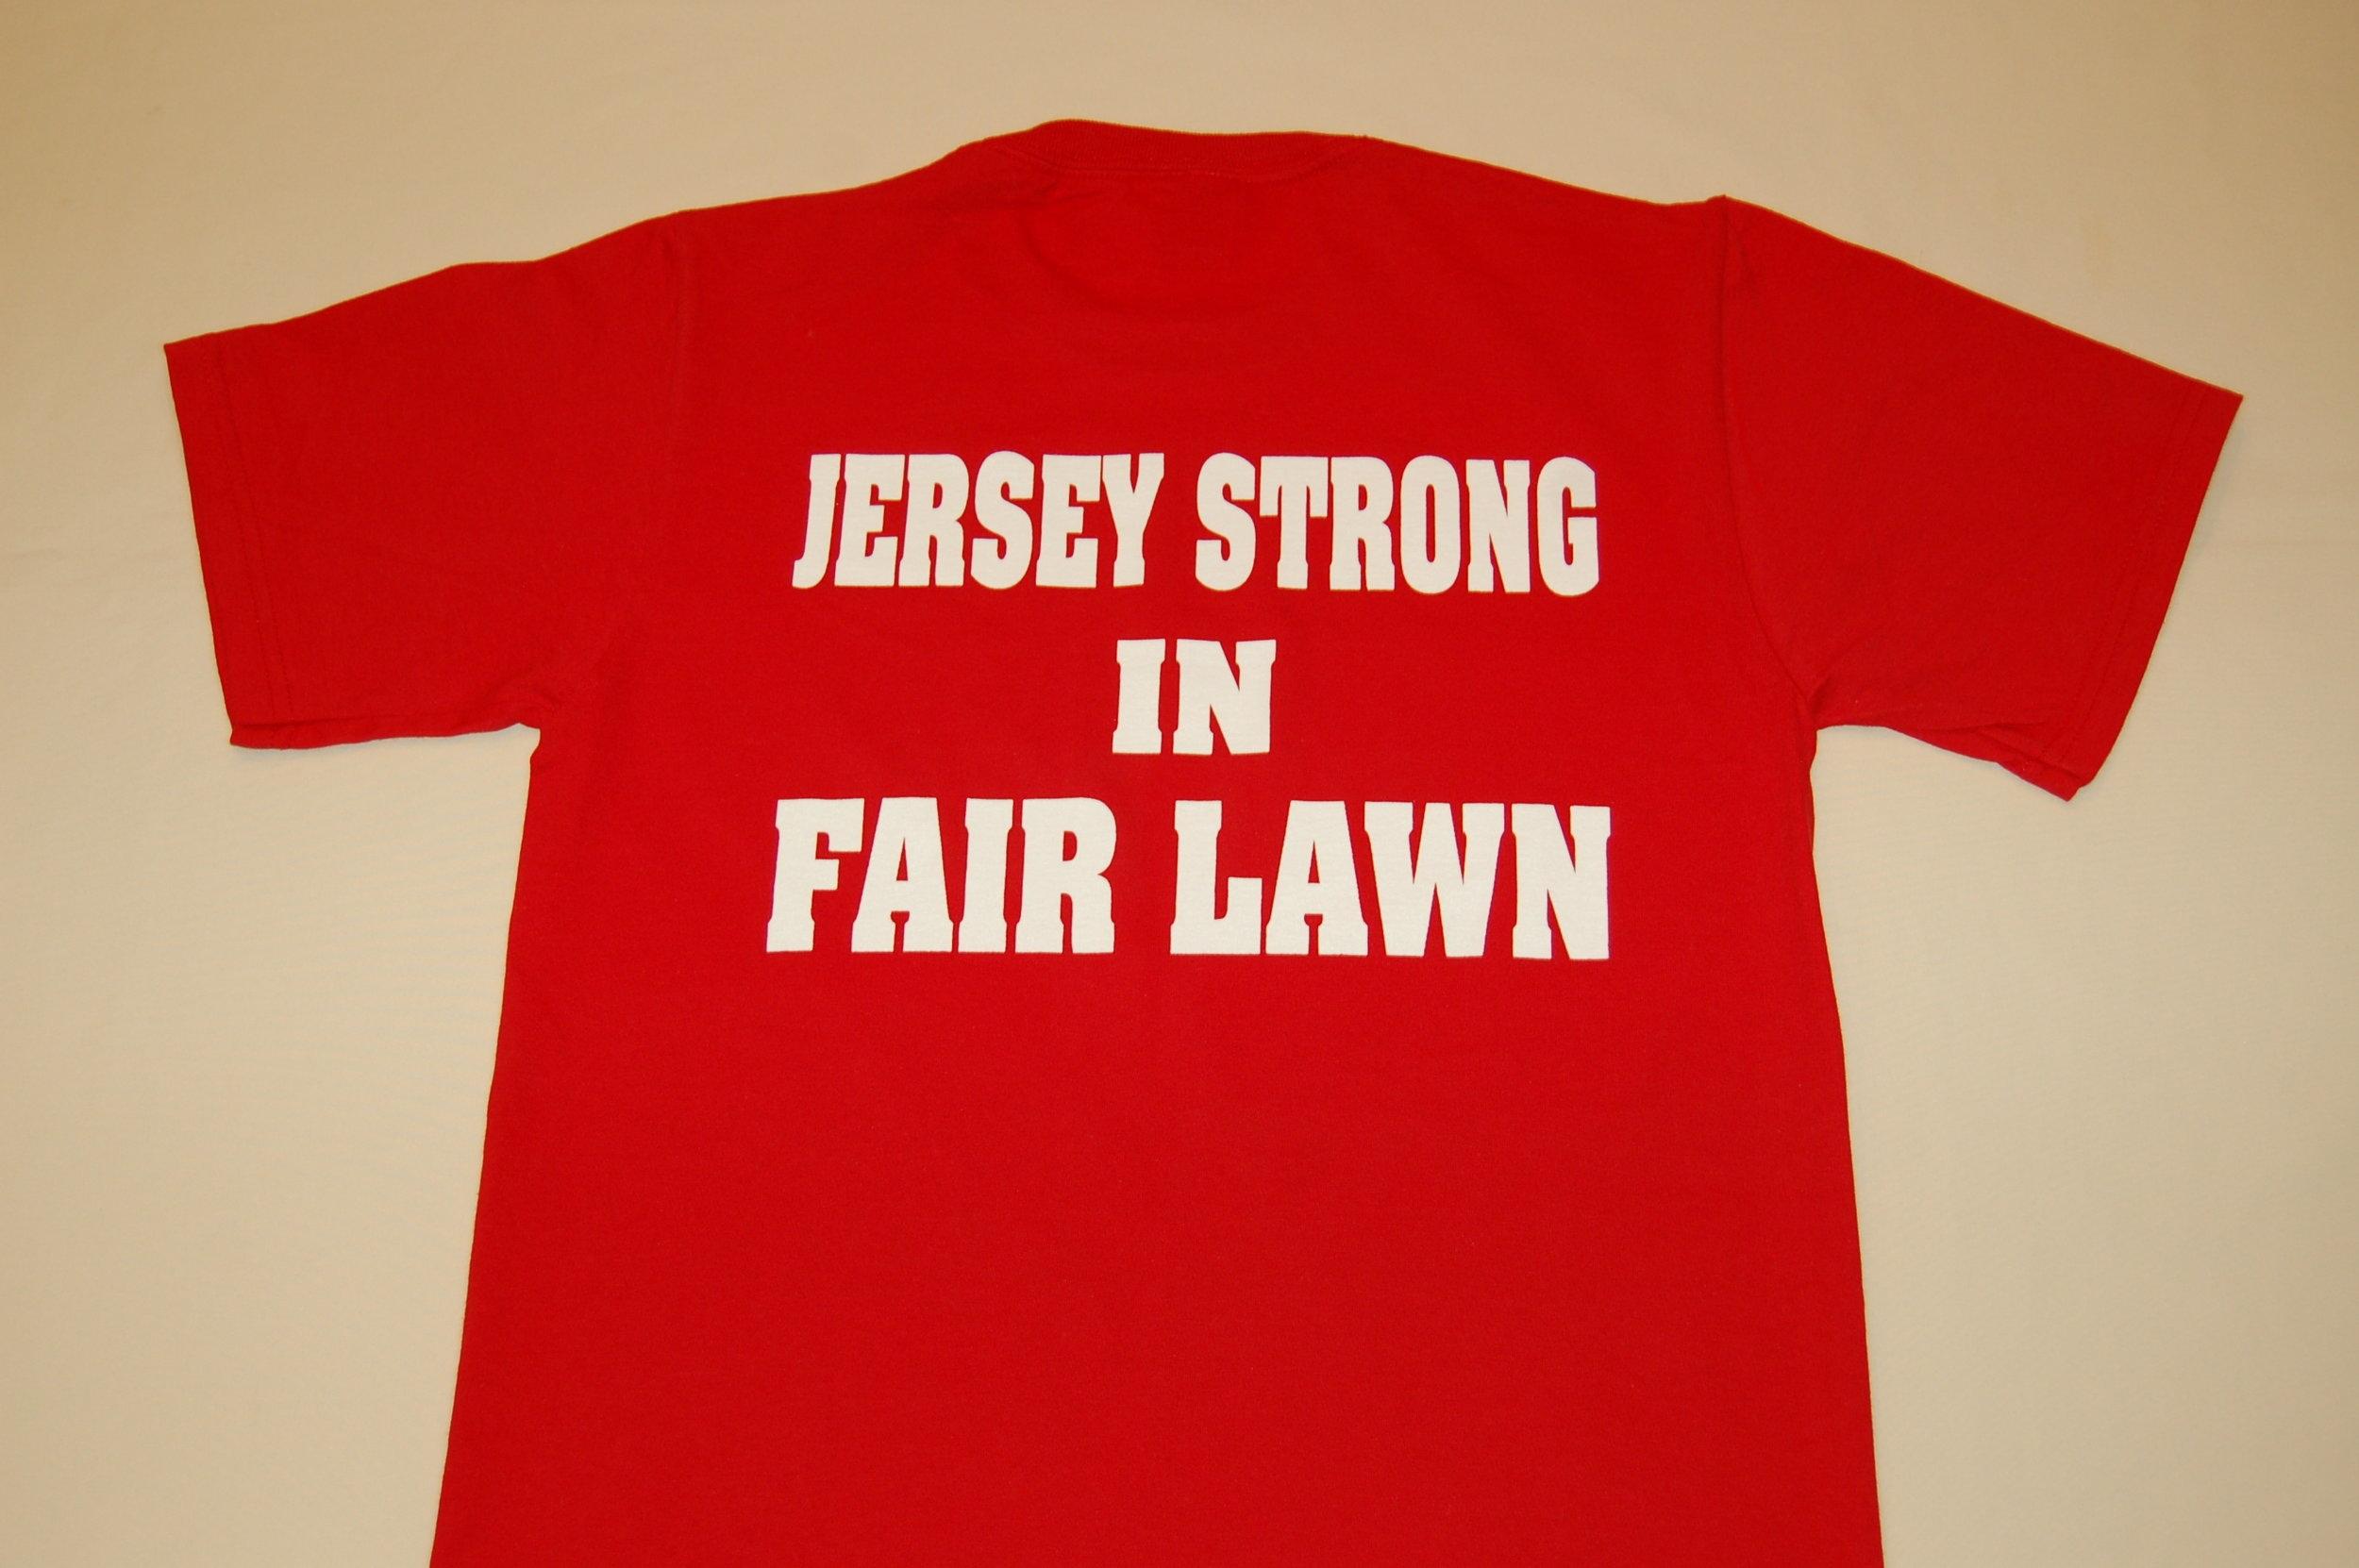 JerseyStrongInFairLawn_back.JPG